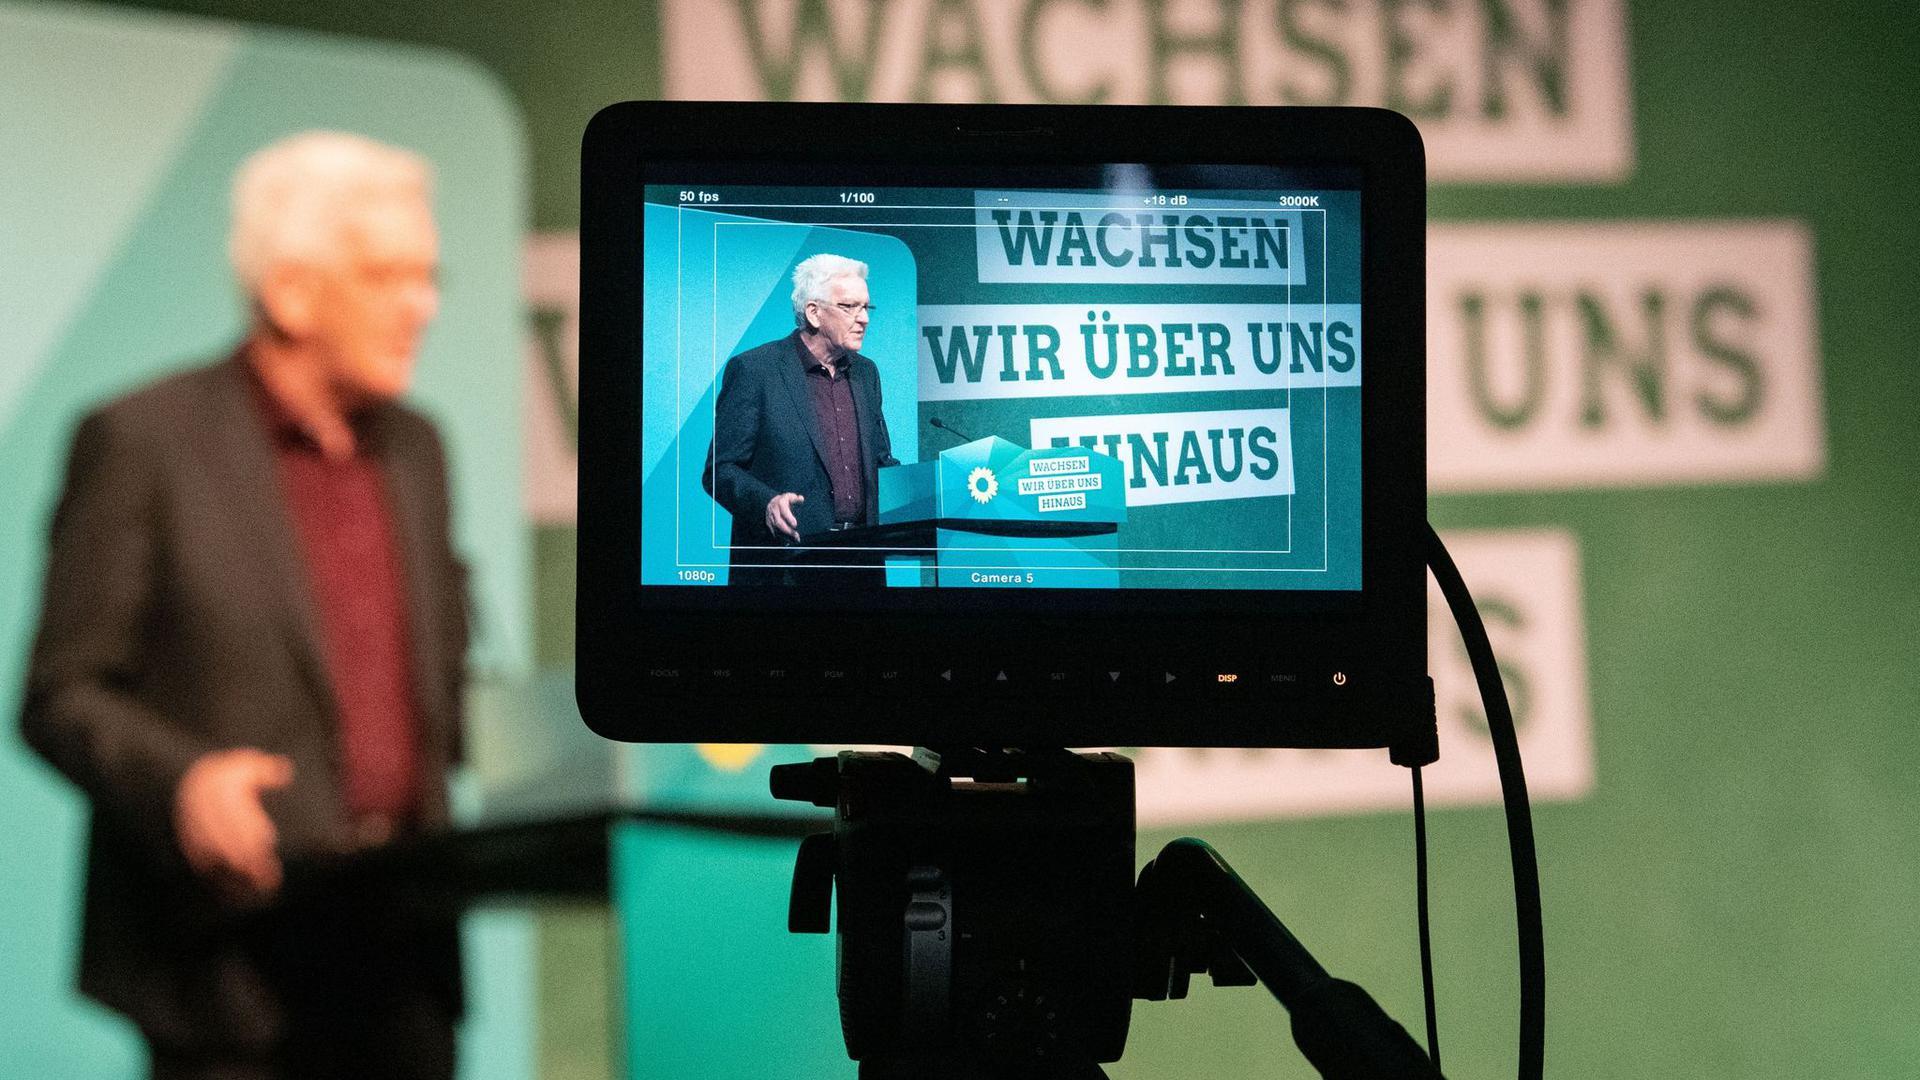 Baden-Württembergs Ministerpräsident Winfried Kretschmann spricht bei der digitalen Landesdelegiertenkonferenz der Grünen.